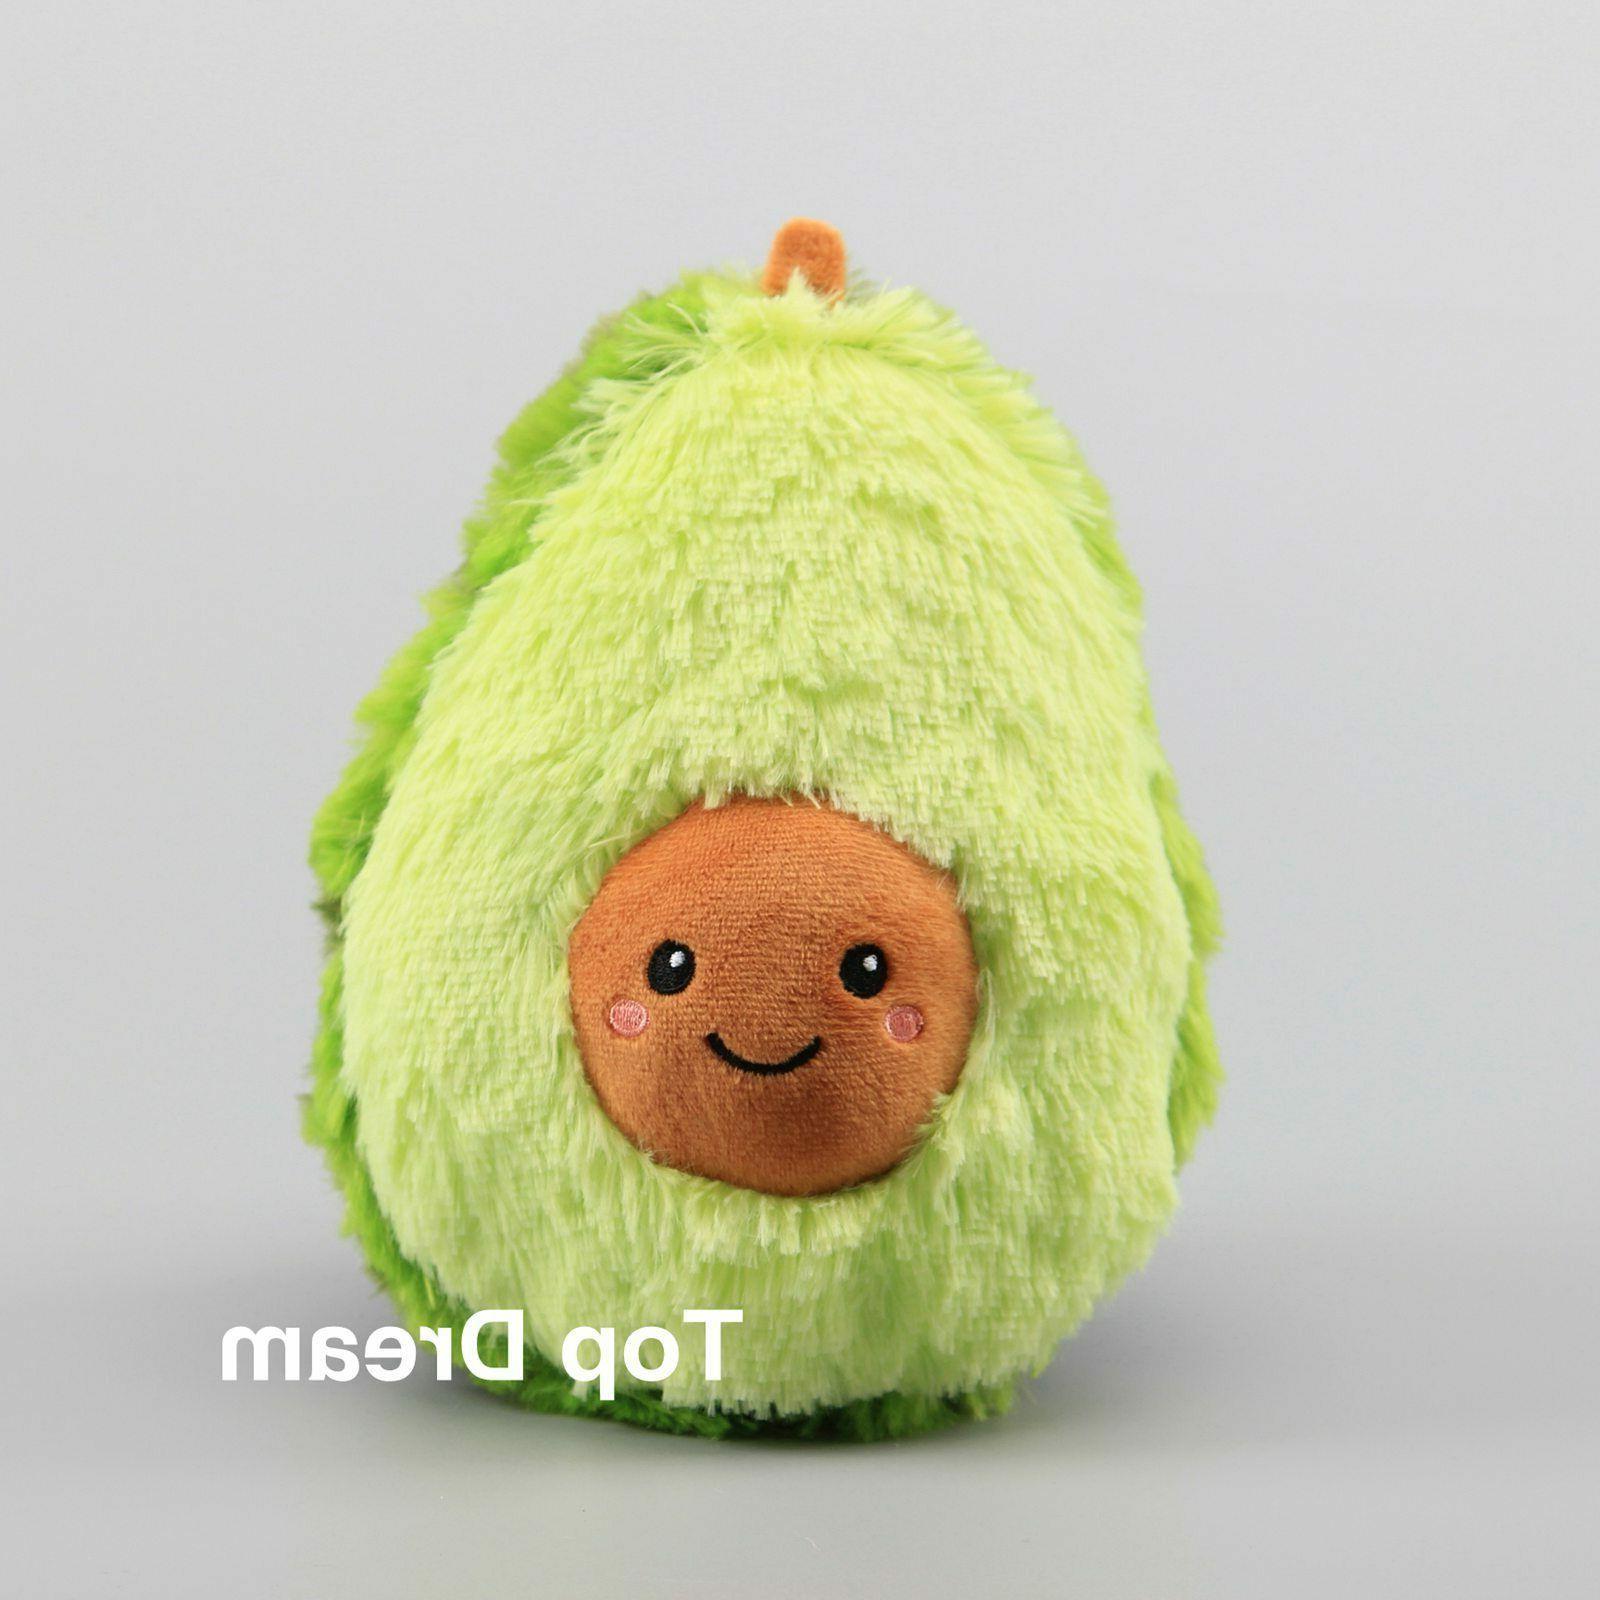 baby toy avocado fruit plush toy soft